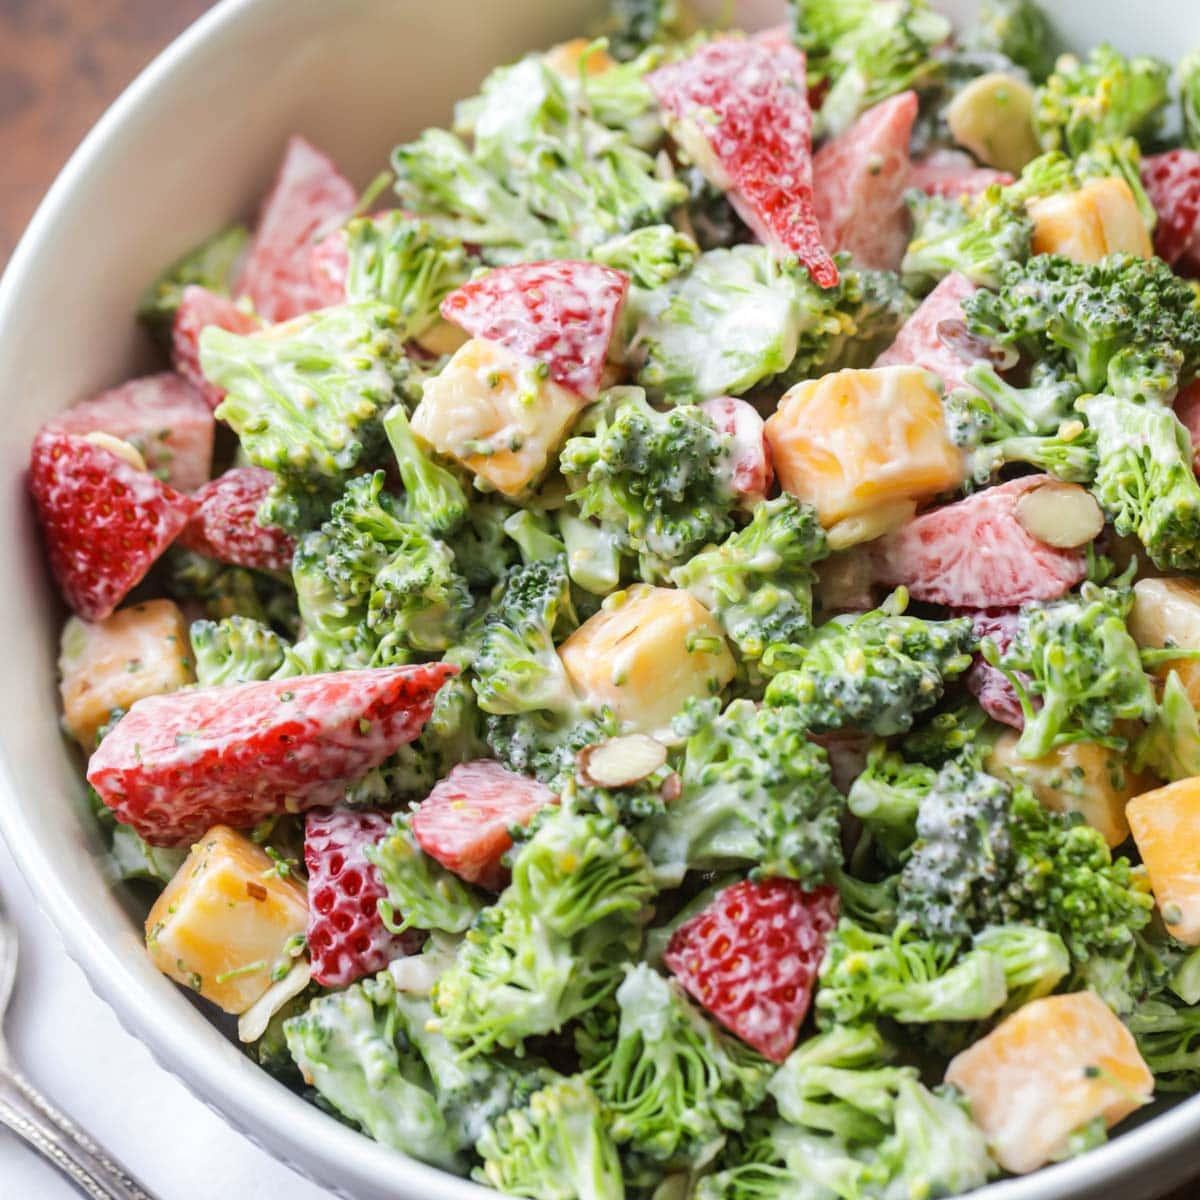 Broccoli strawberry salad close up image